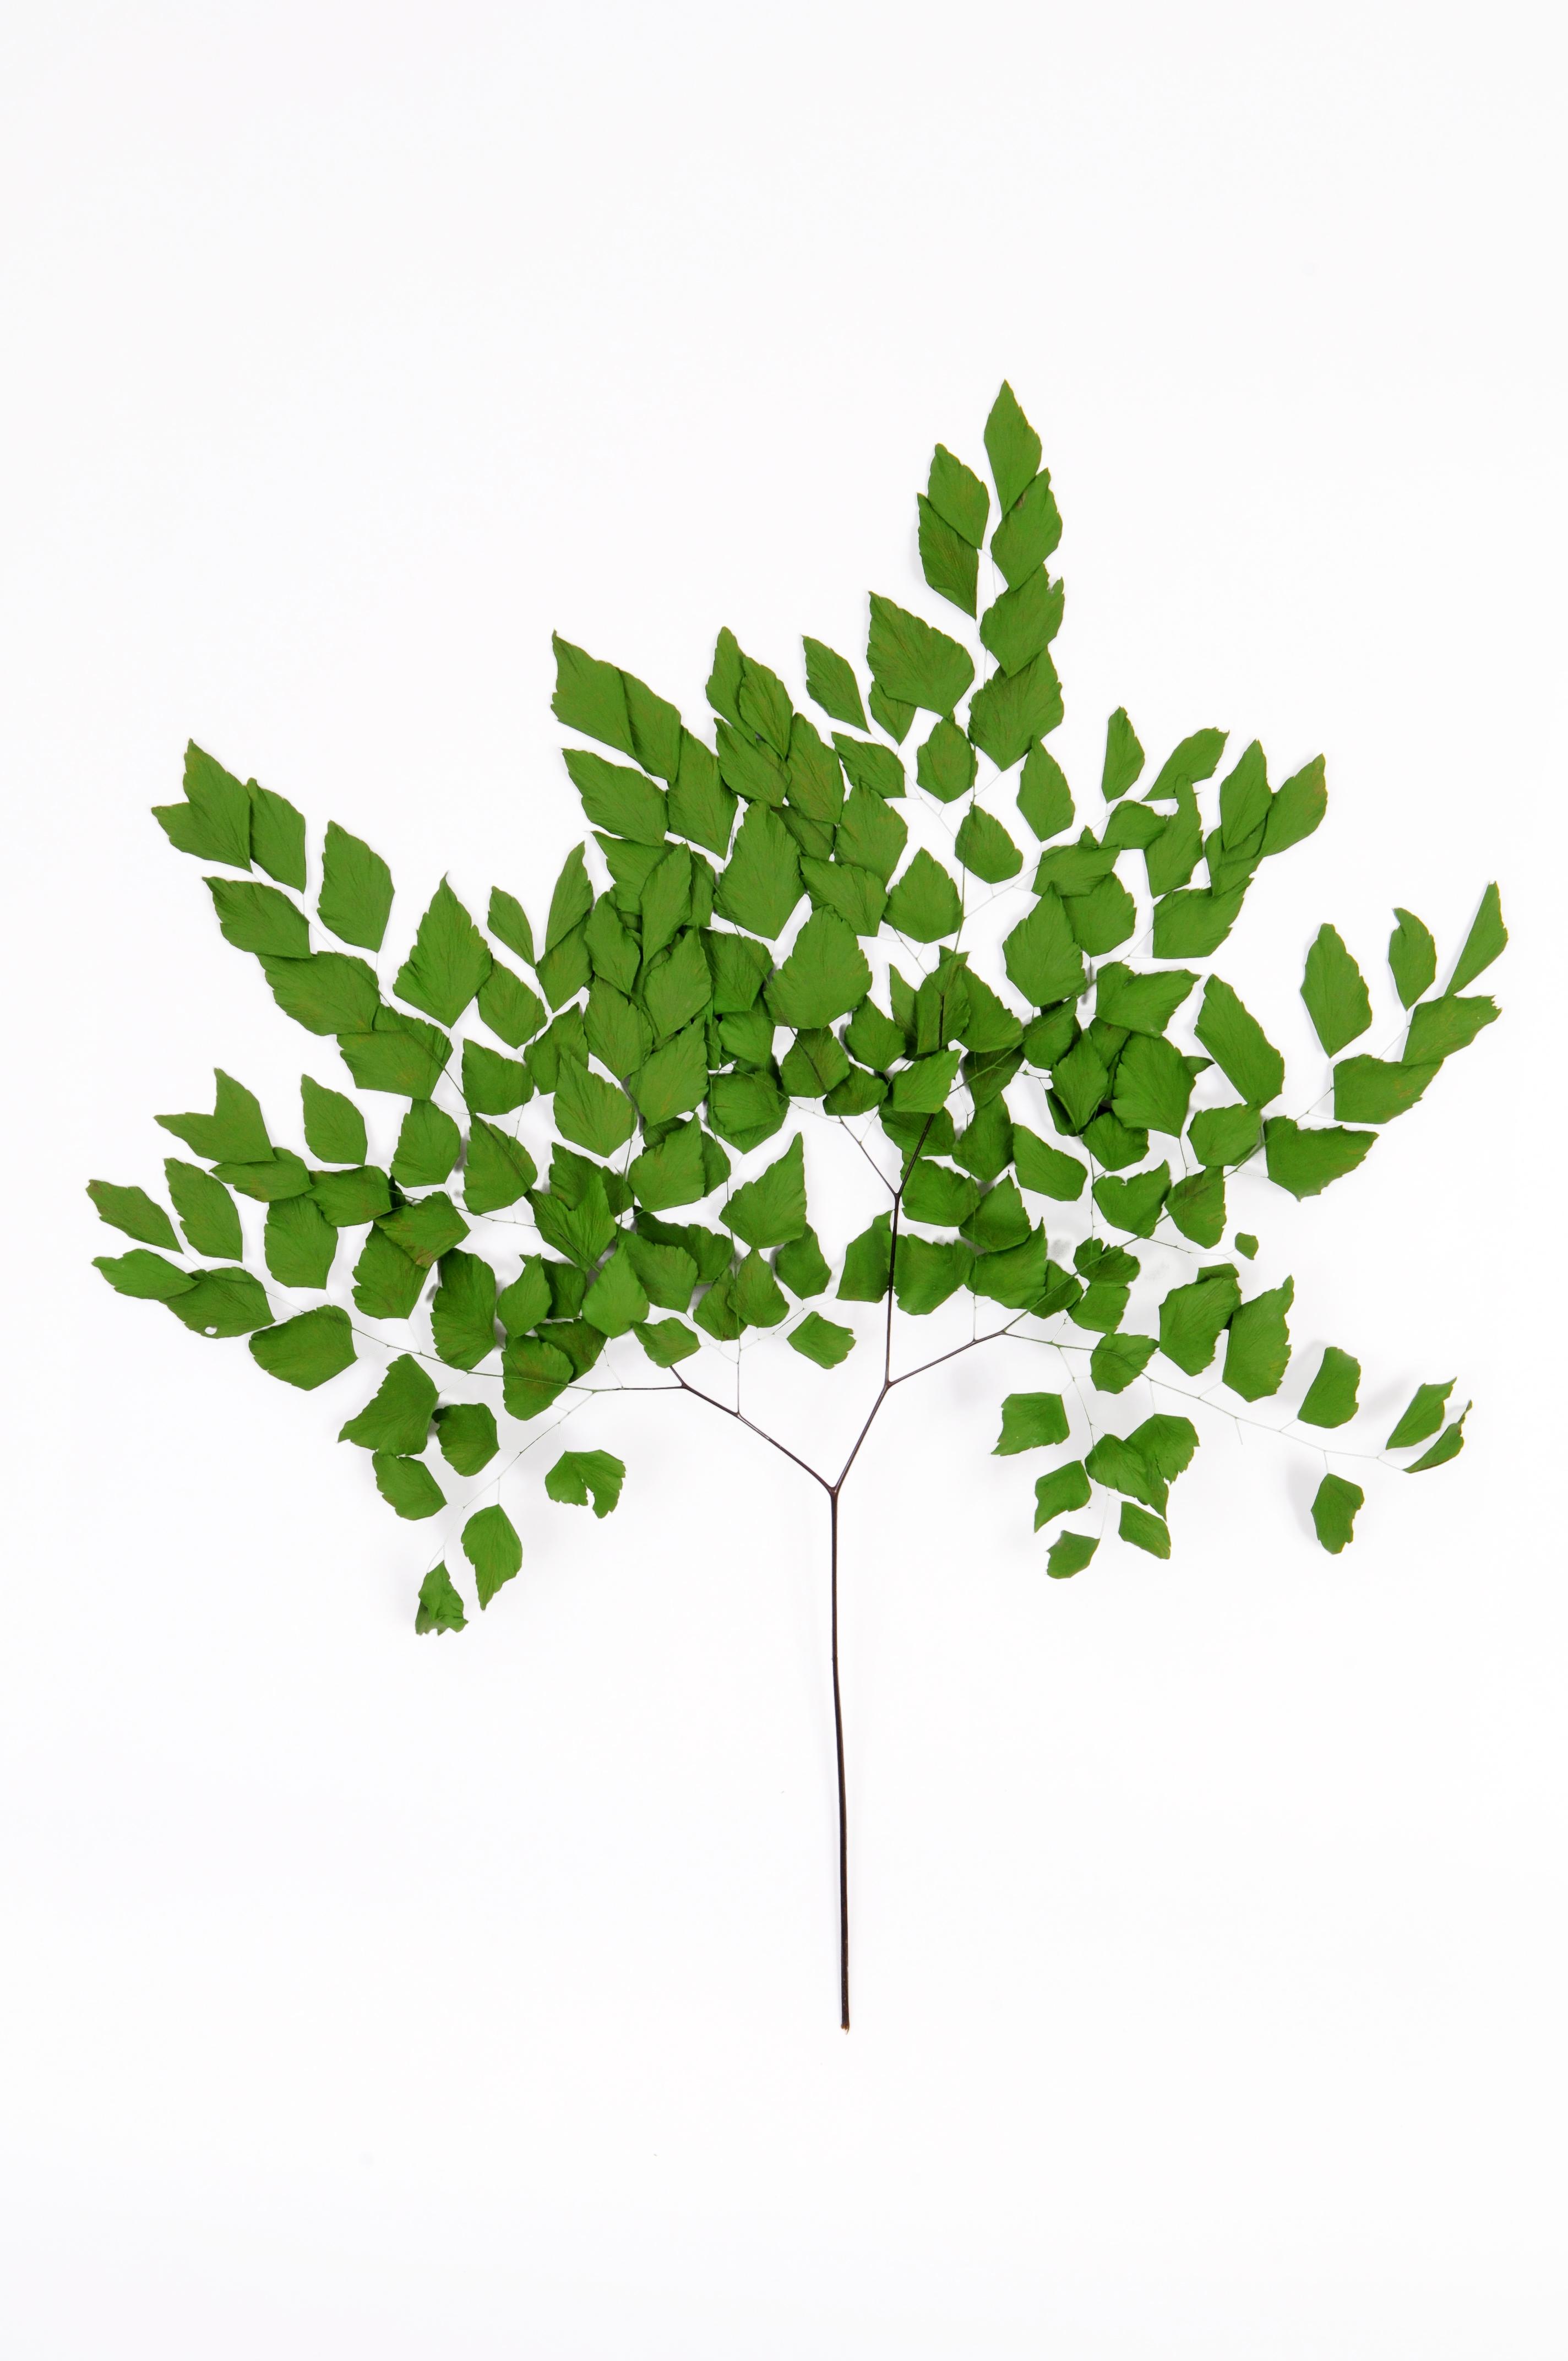 planta desidratada paisagismo preservada